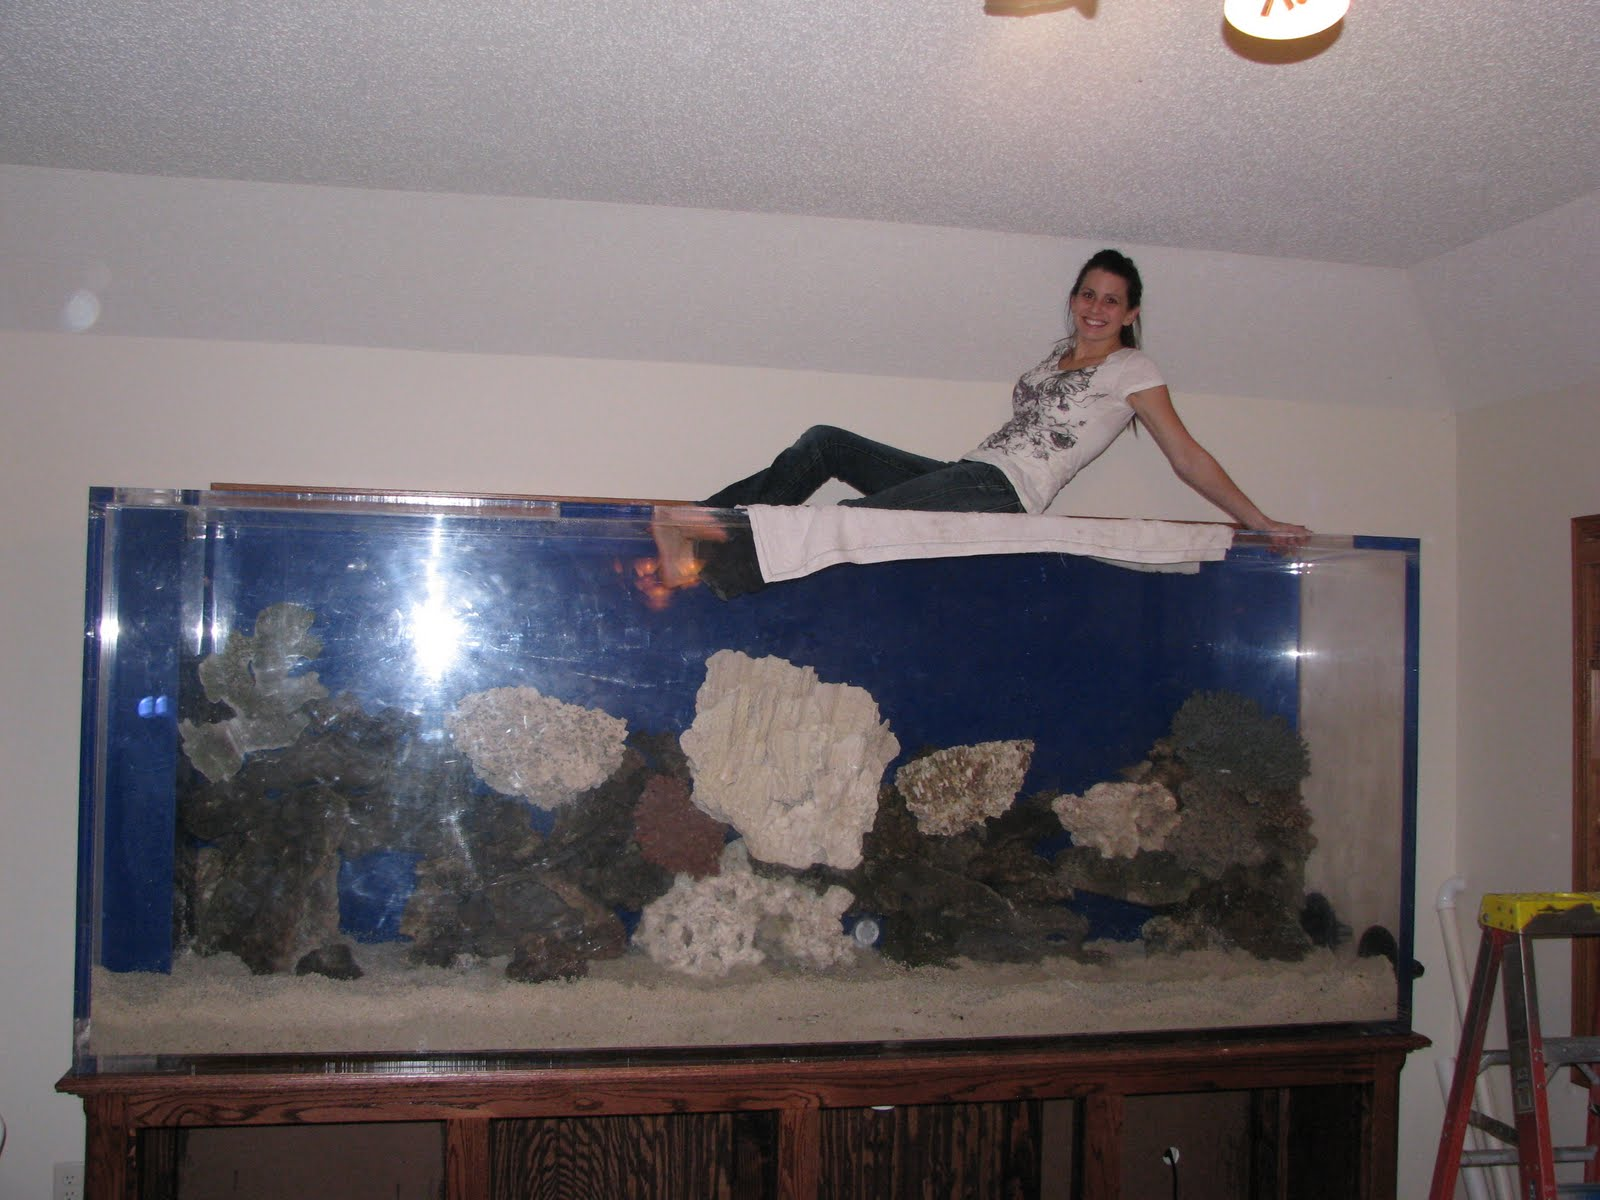 100 gallon fish tank 600 fish tank aquarium 560 gallons for 10 gallon fish tank for sale